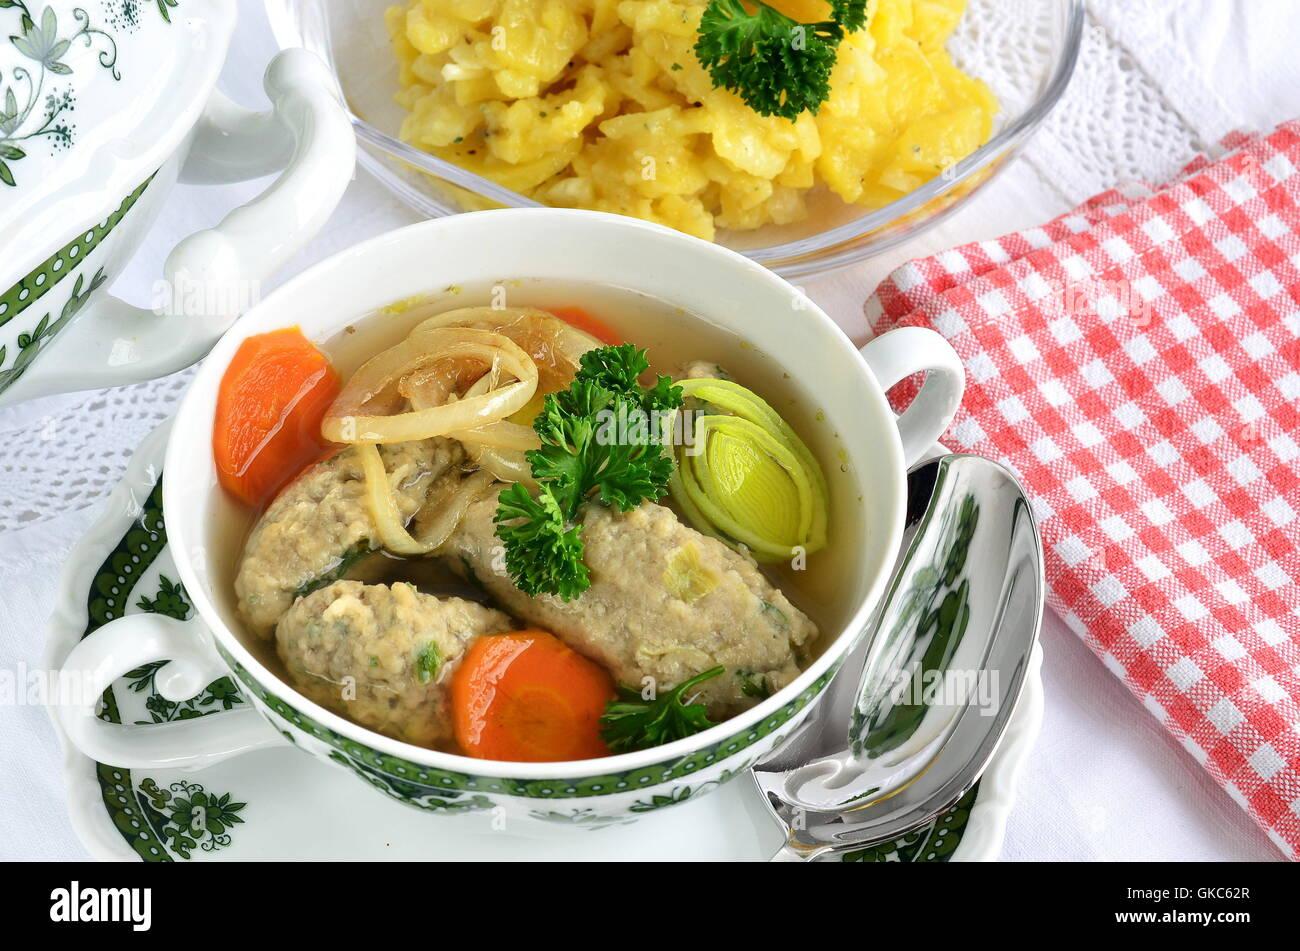 food dish meal Stock Photo